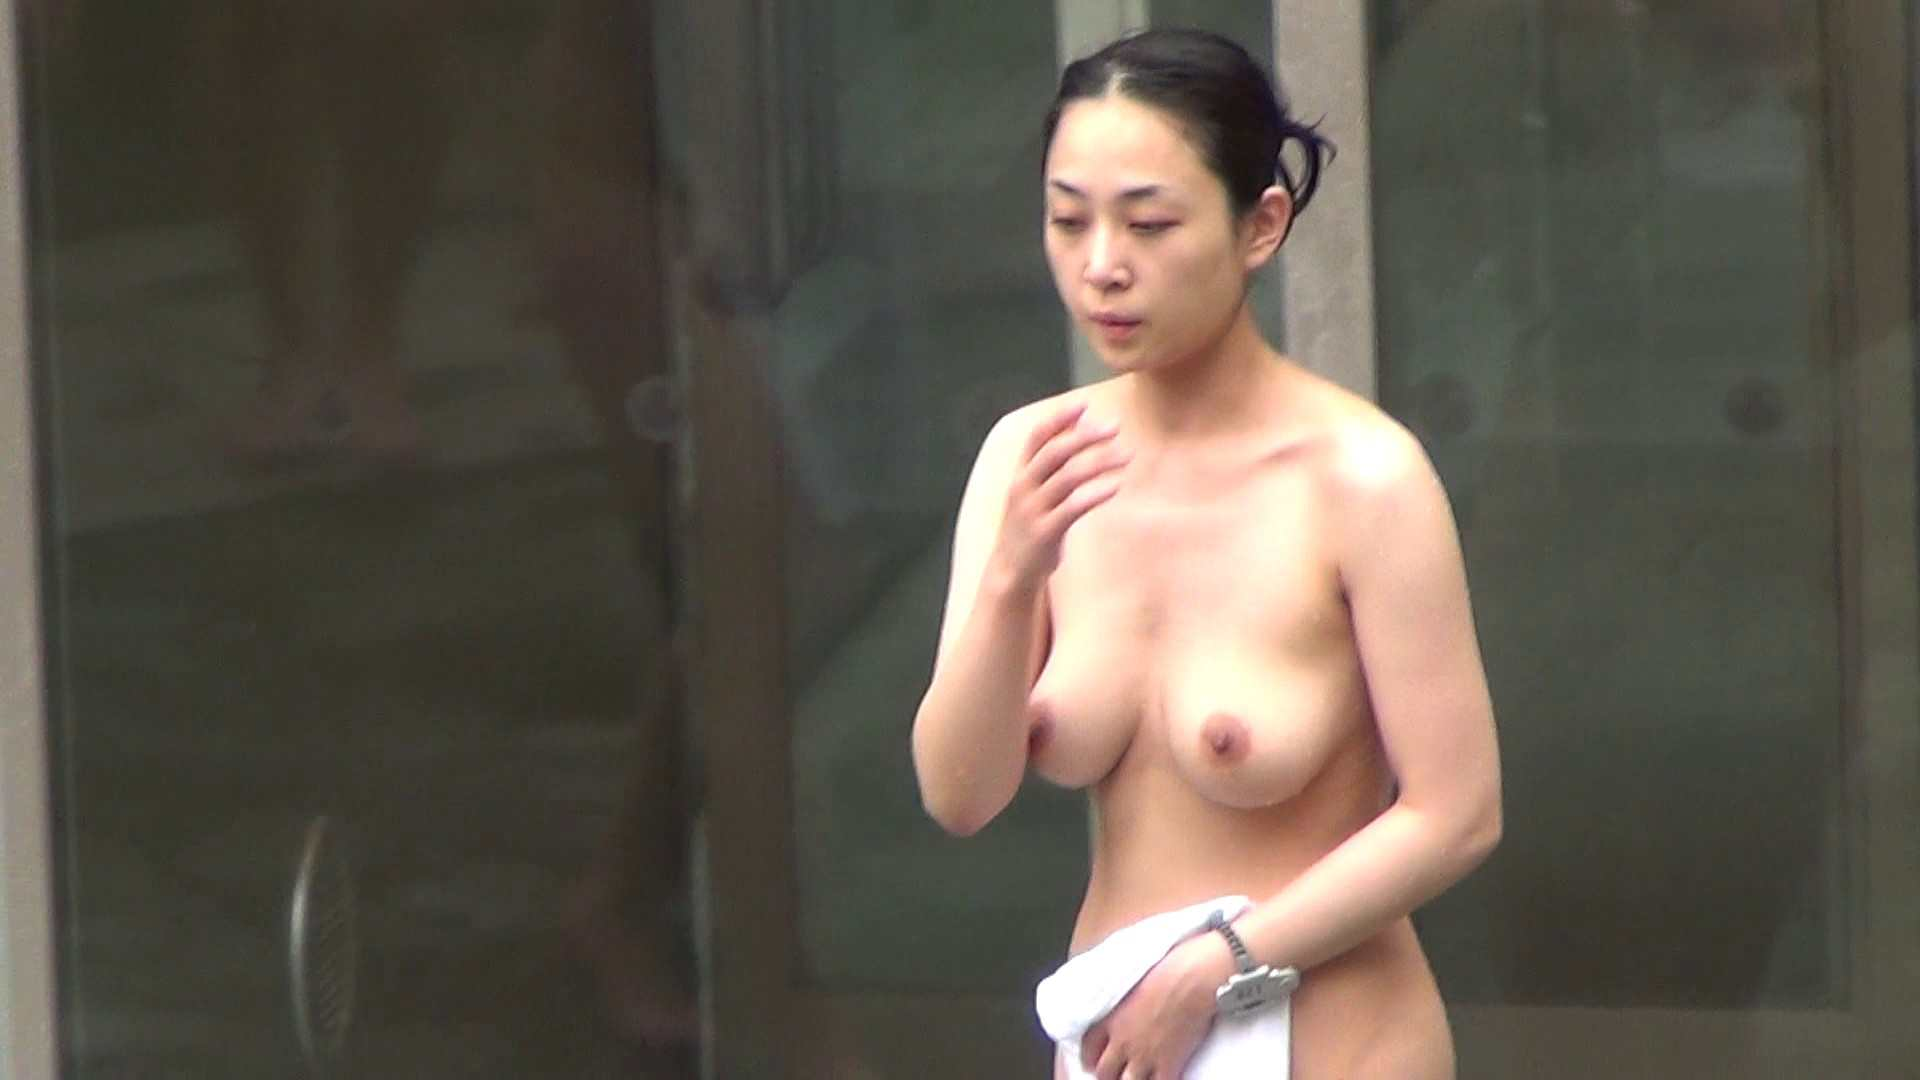 Aquaな露天風呂Vol.231 エッチな盗撮   0  113pic 37